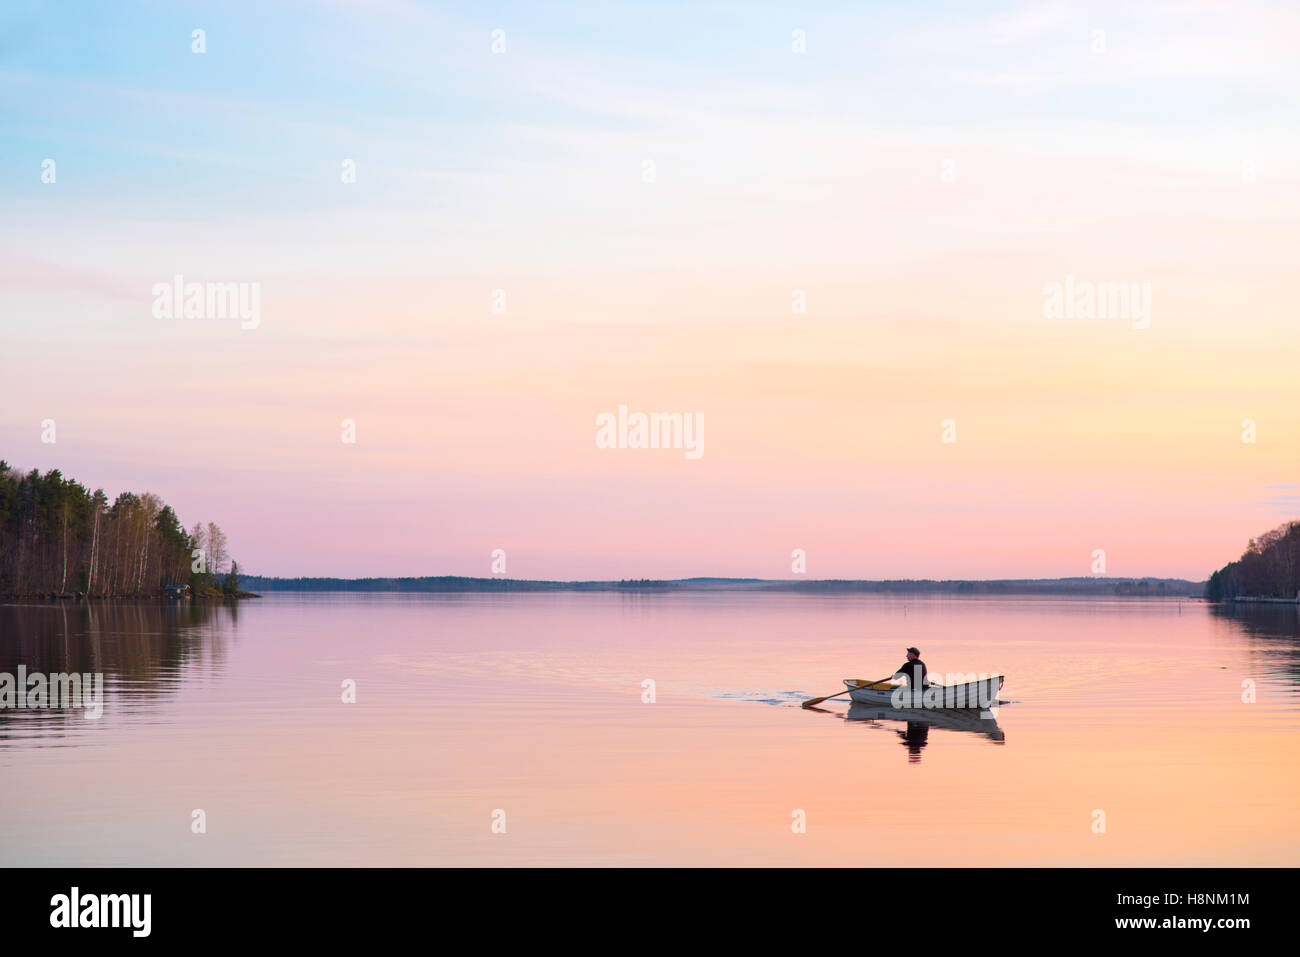 Man in boat on lake - Stock Image